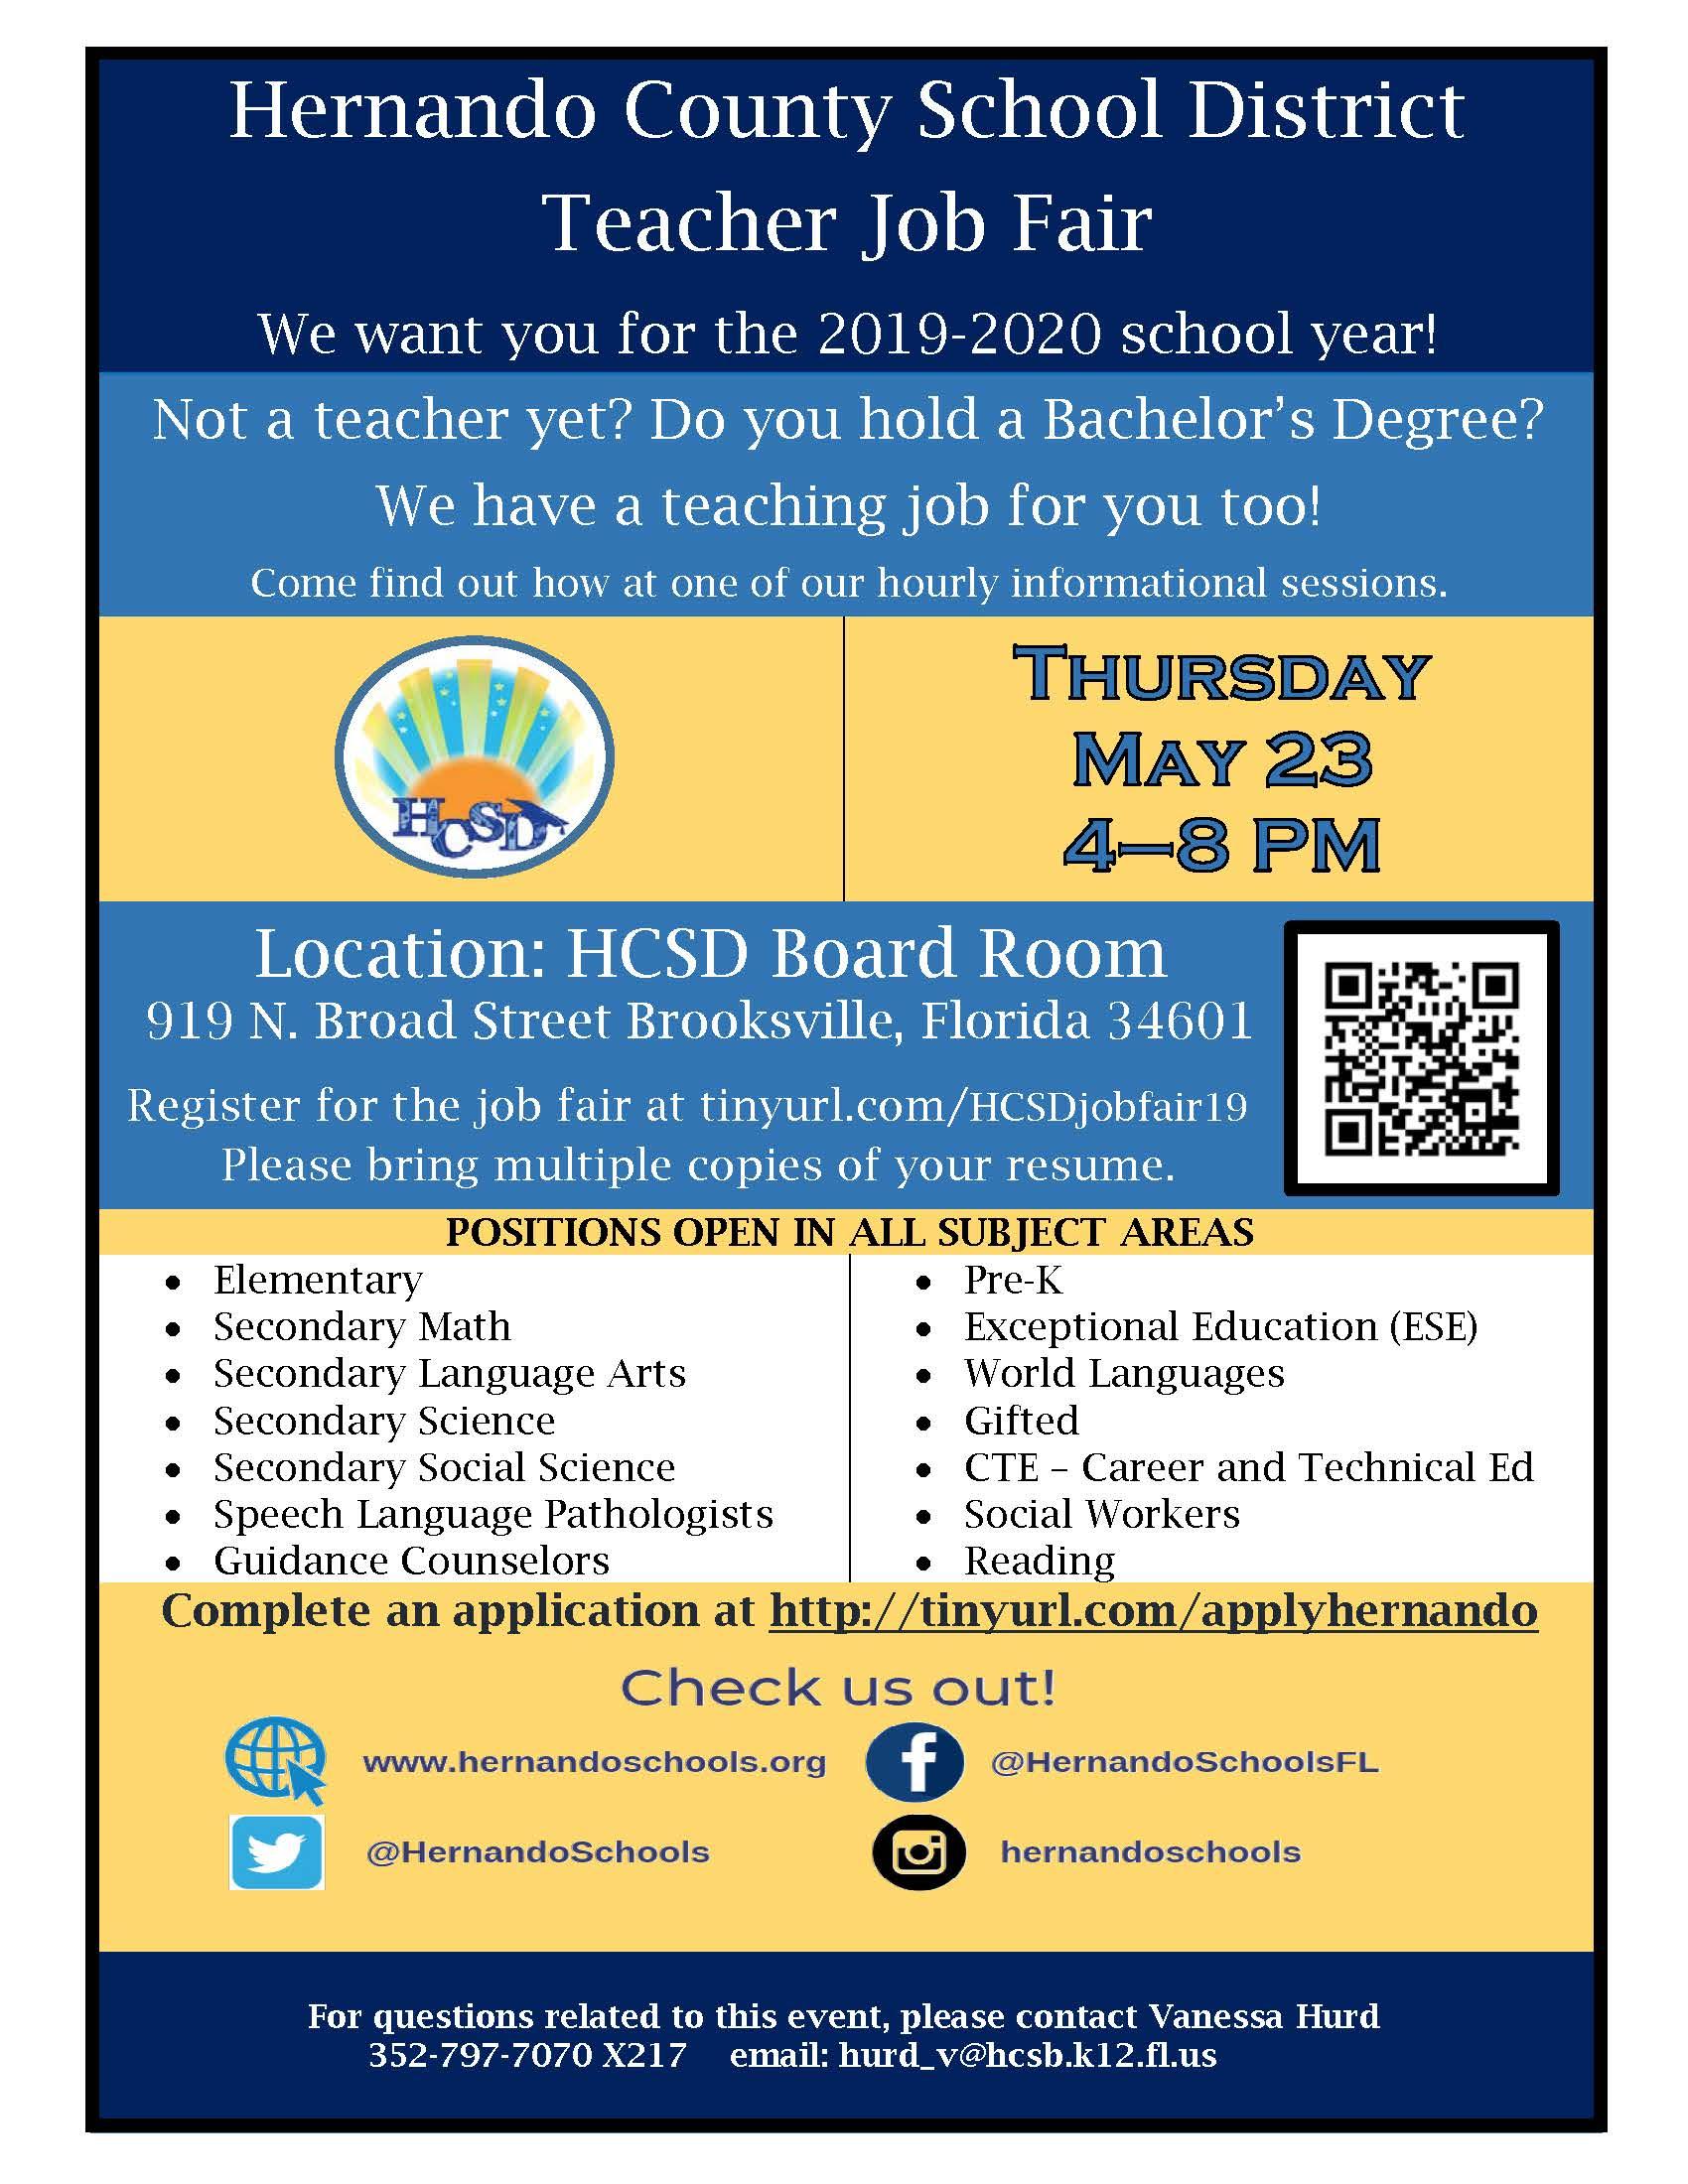 Hernando County Events 2020.Hernando County School District Teacher Job Fair Student